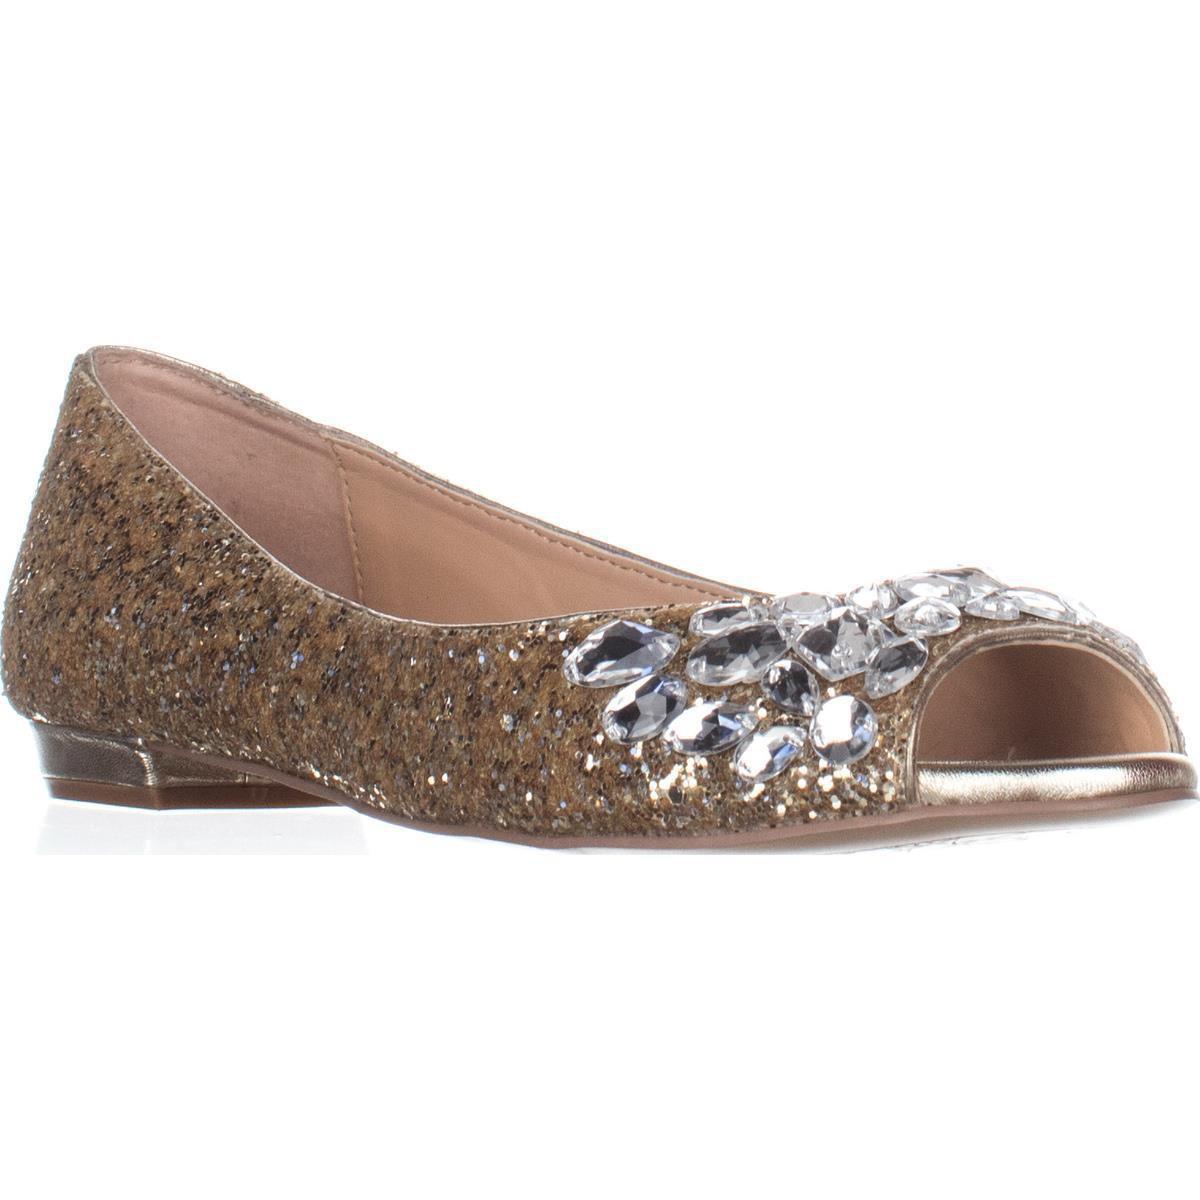 29c22fd77 Lyst - Badgley Mischka Jewel By Claire Rhinestone Ballet Flats